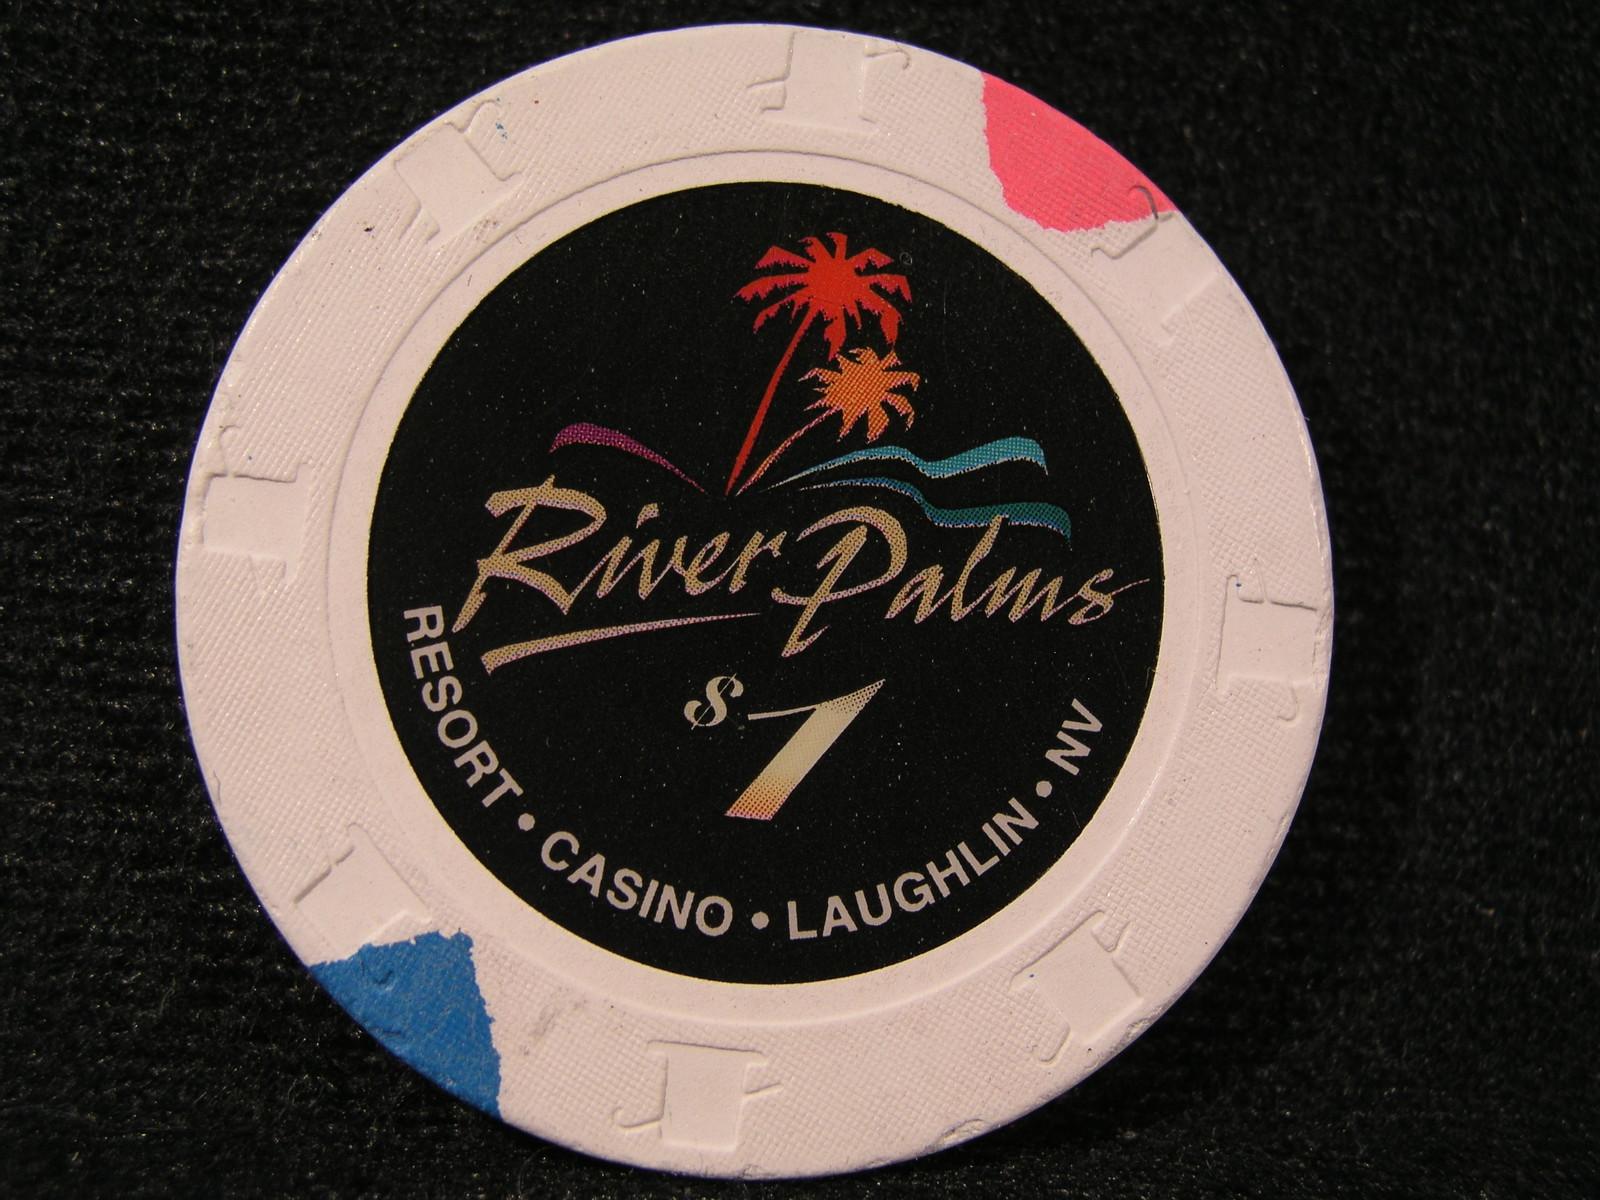 "$1.00 CASINO CHIP FROM: ""RIVER PALMS RESORT CASINO"" - (sku#2439)"